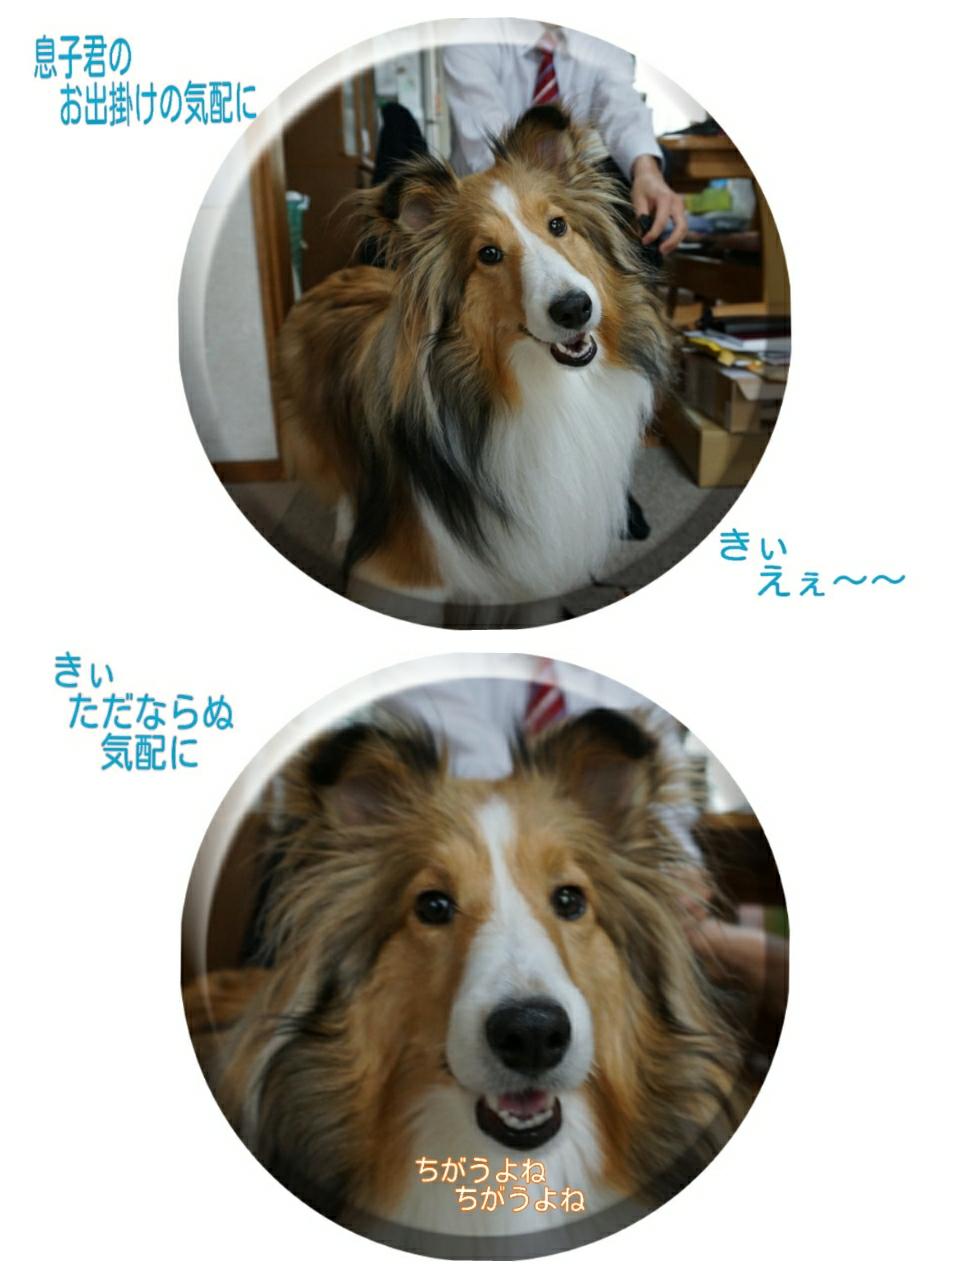 2015-04-01-10-51-17_deco.jpg